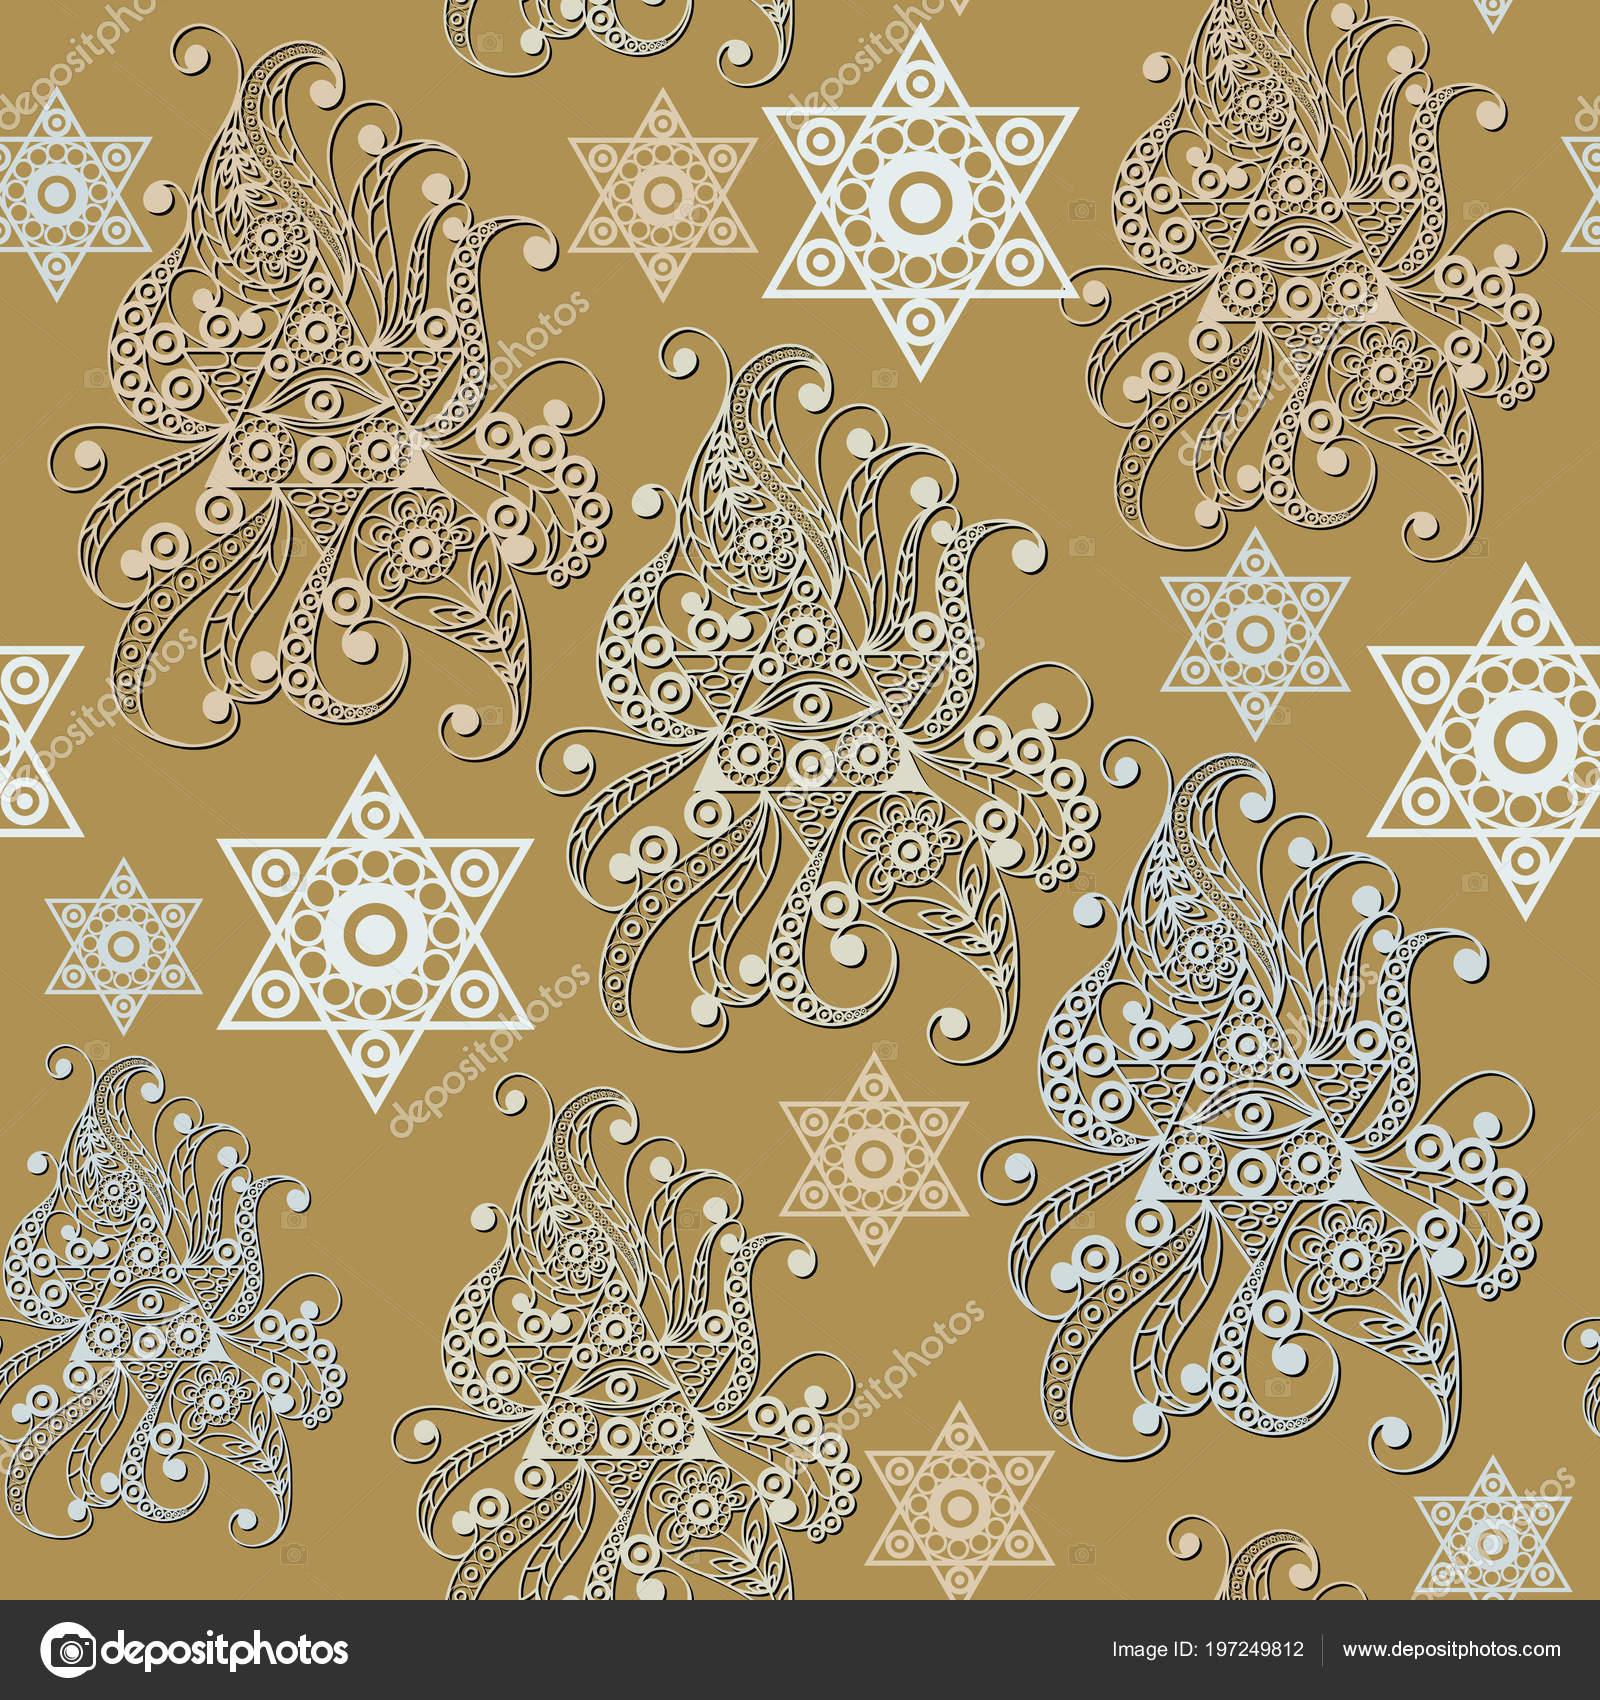 Seamless Background Occult Symbol Masonic Freemasonic Texture